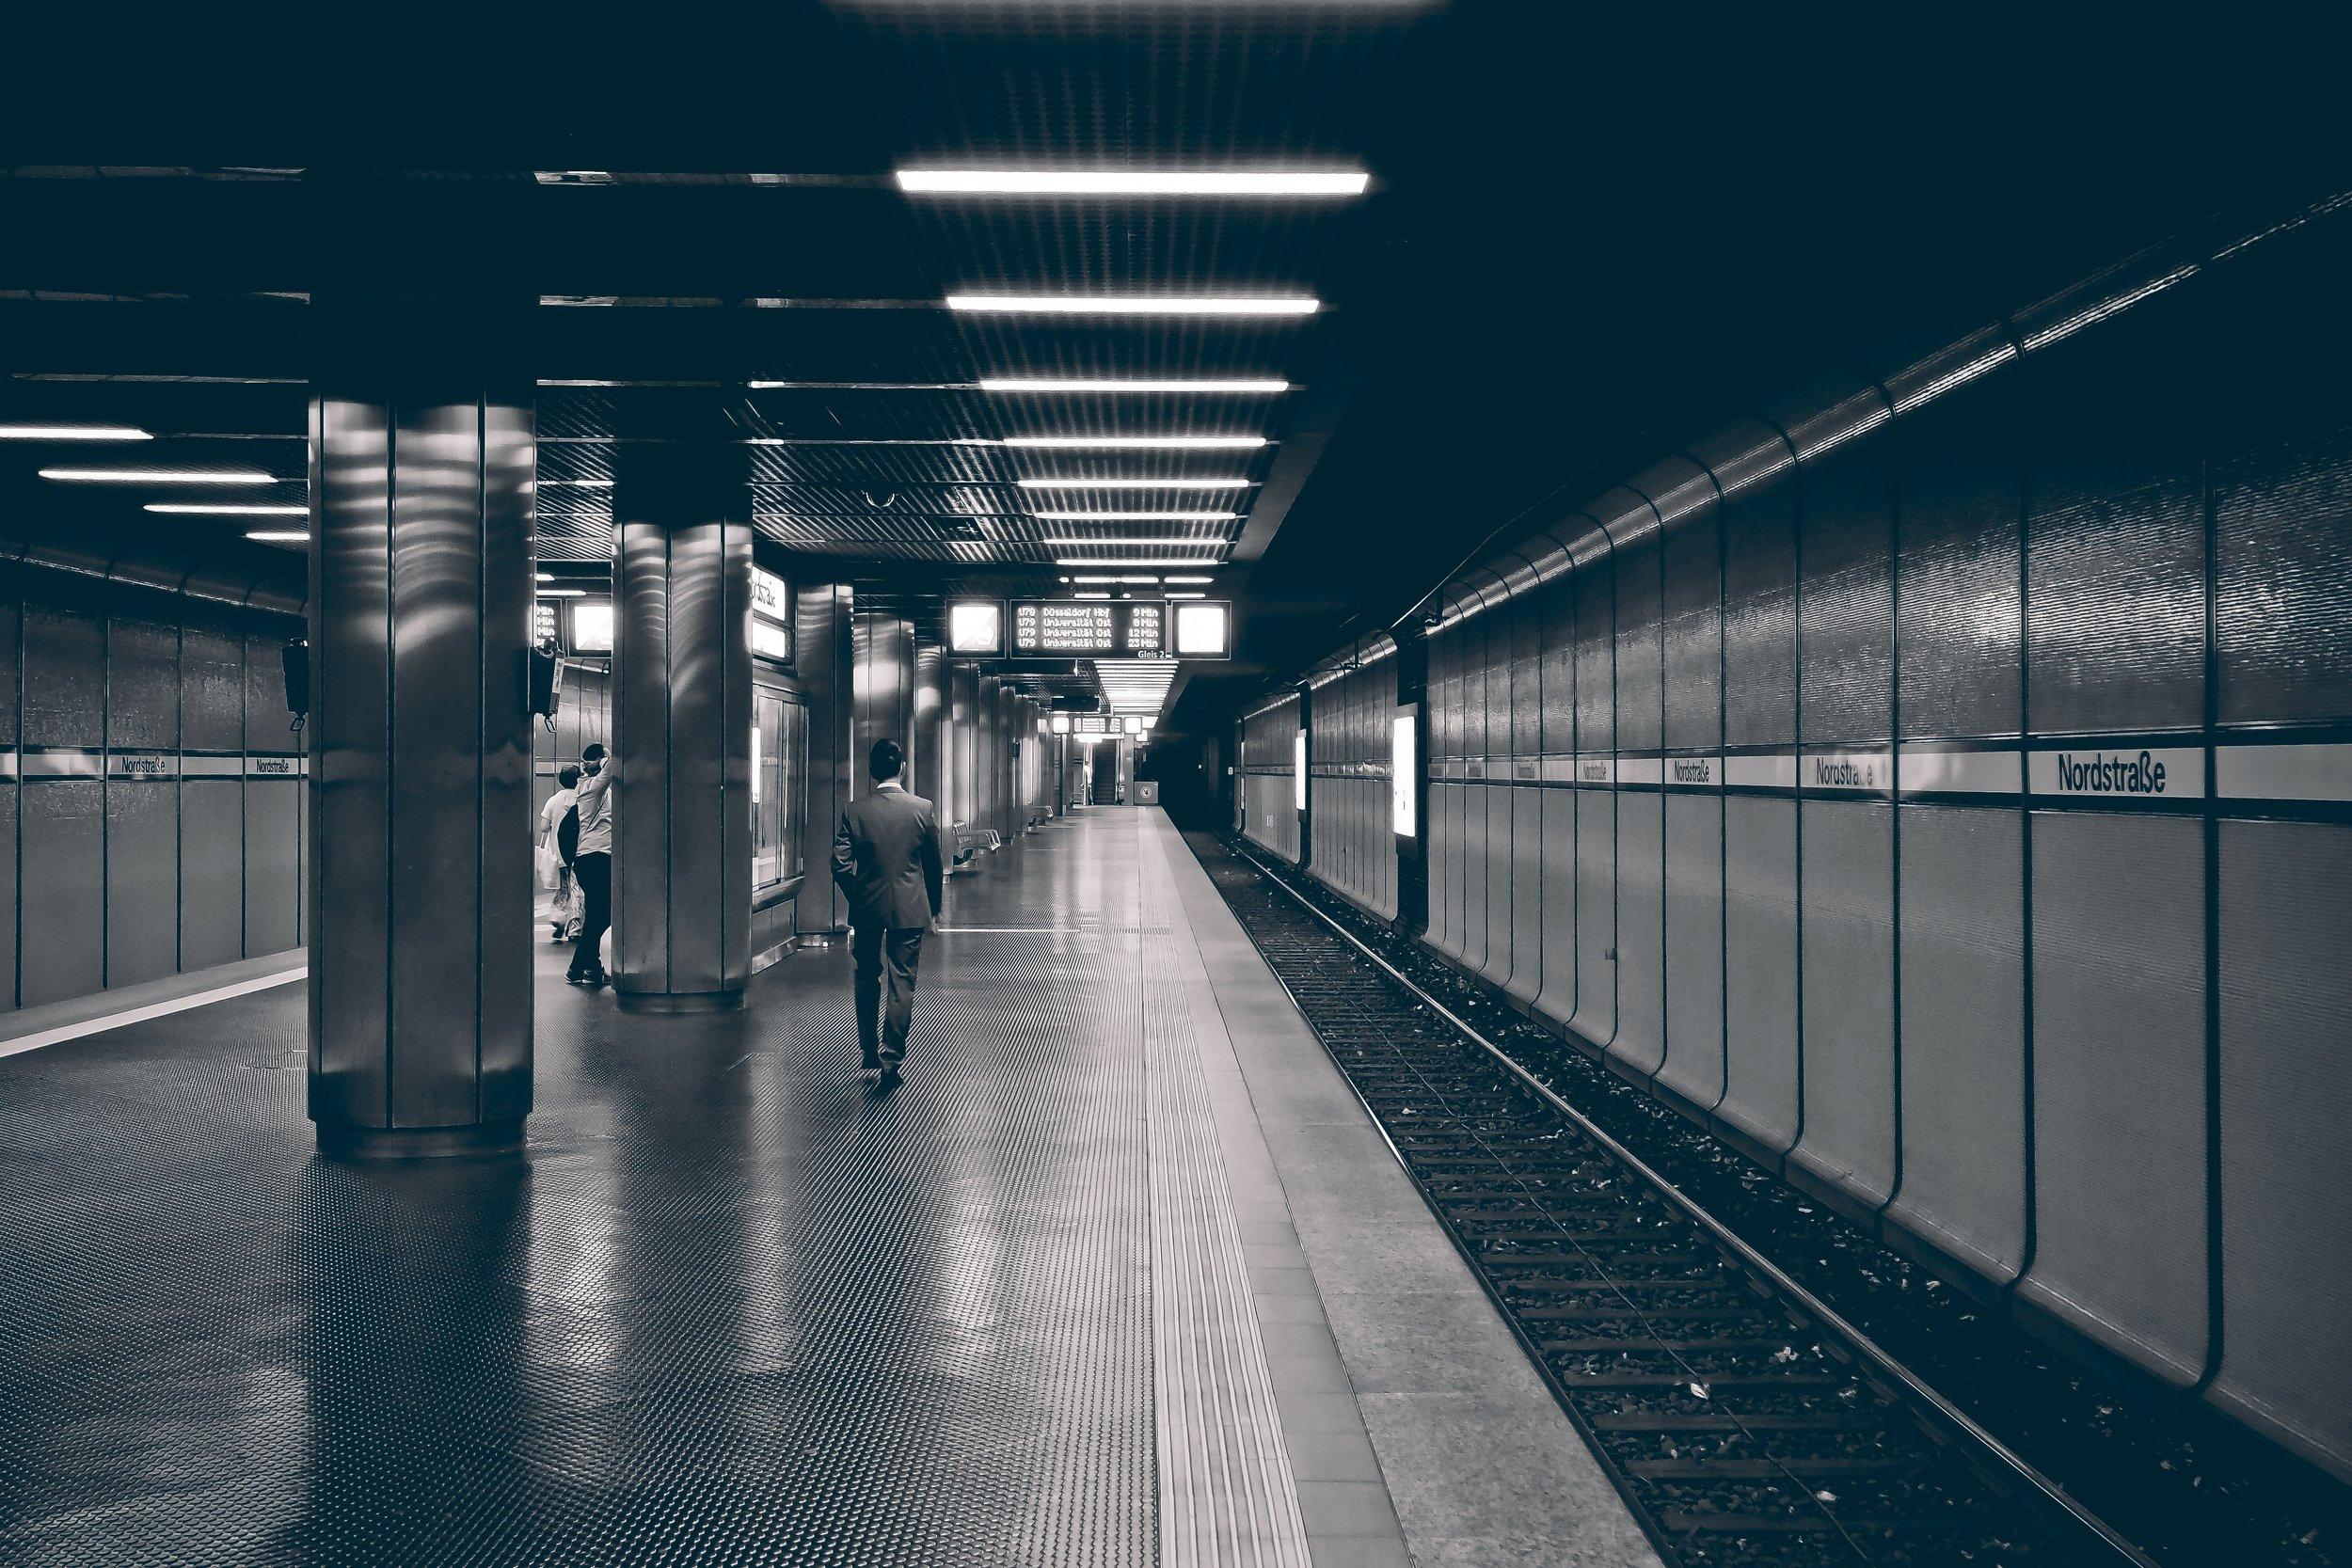 Man on train platform black and white